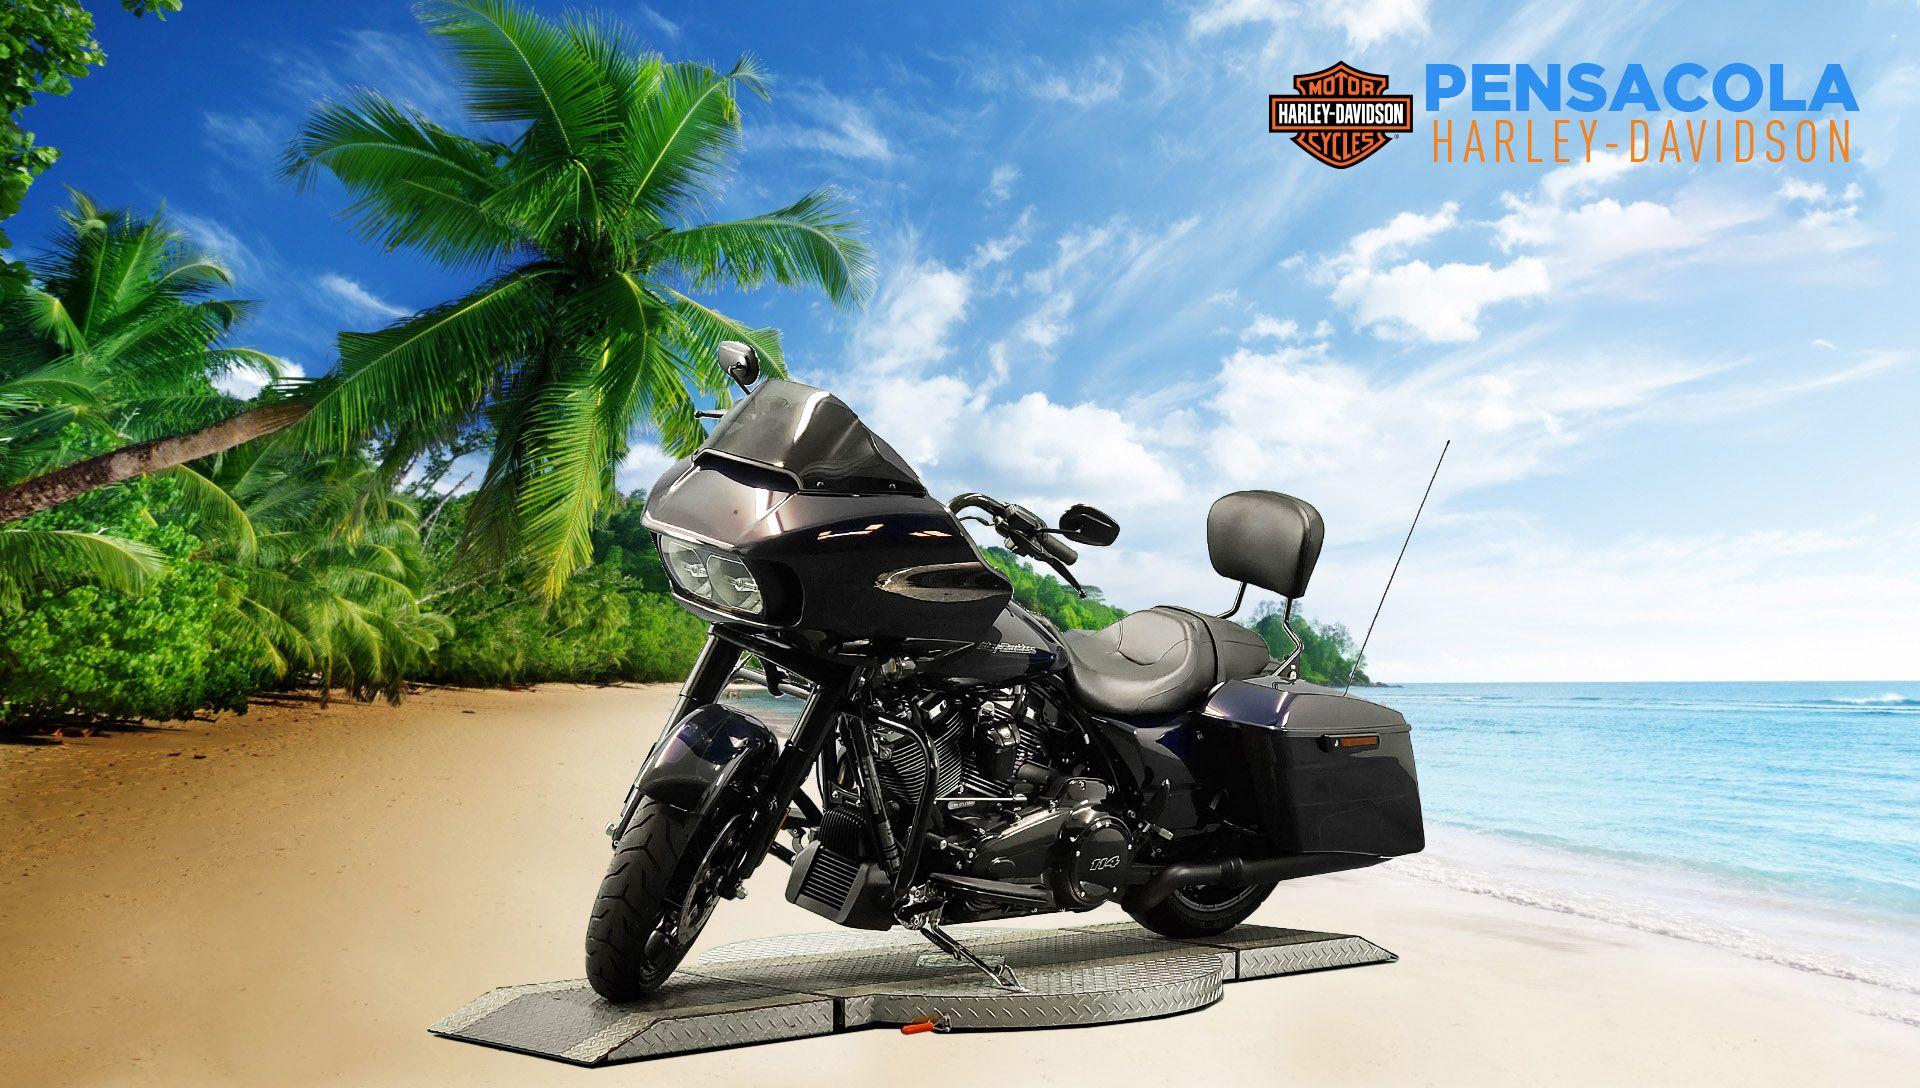 Pre-Owned 2020 Harley-Davidson Road Glide Special FLTRXS